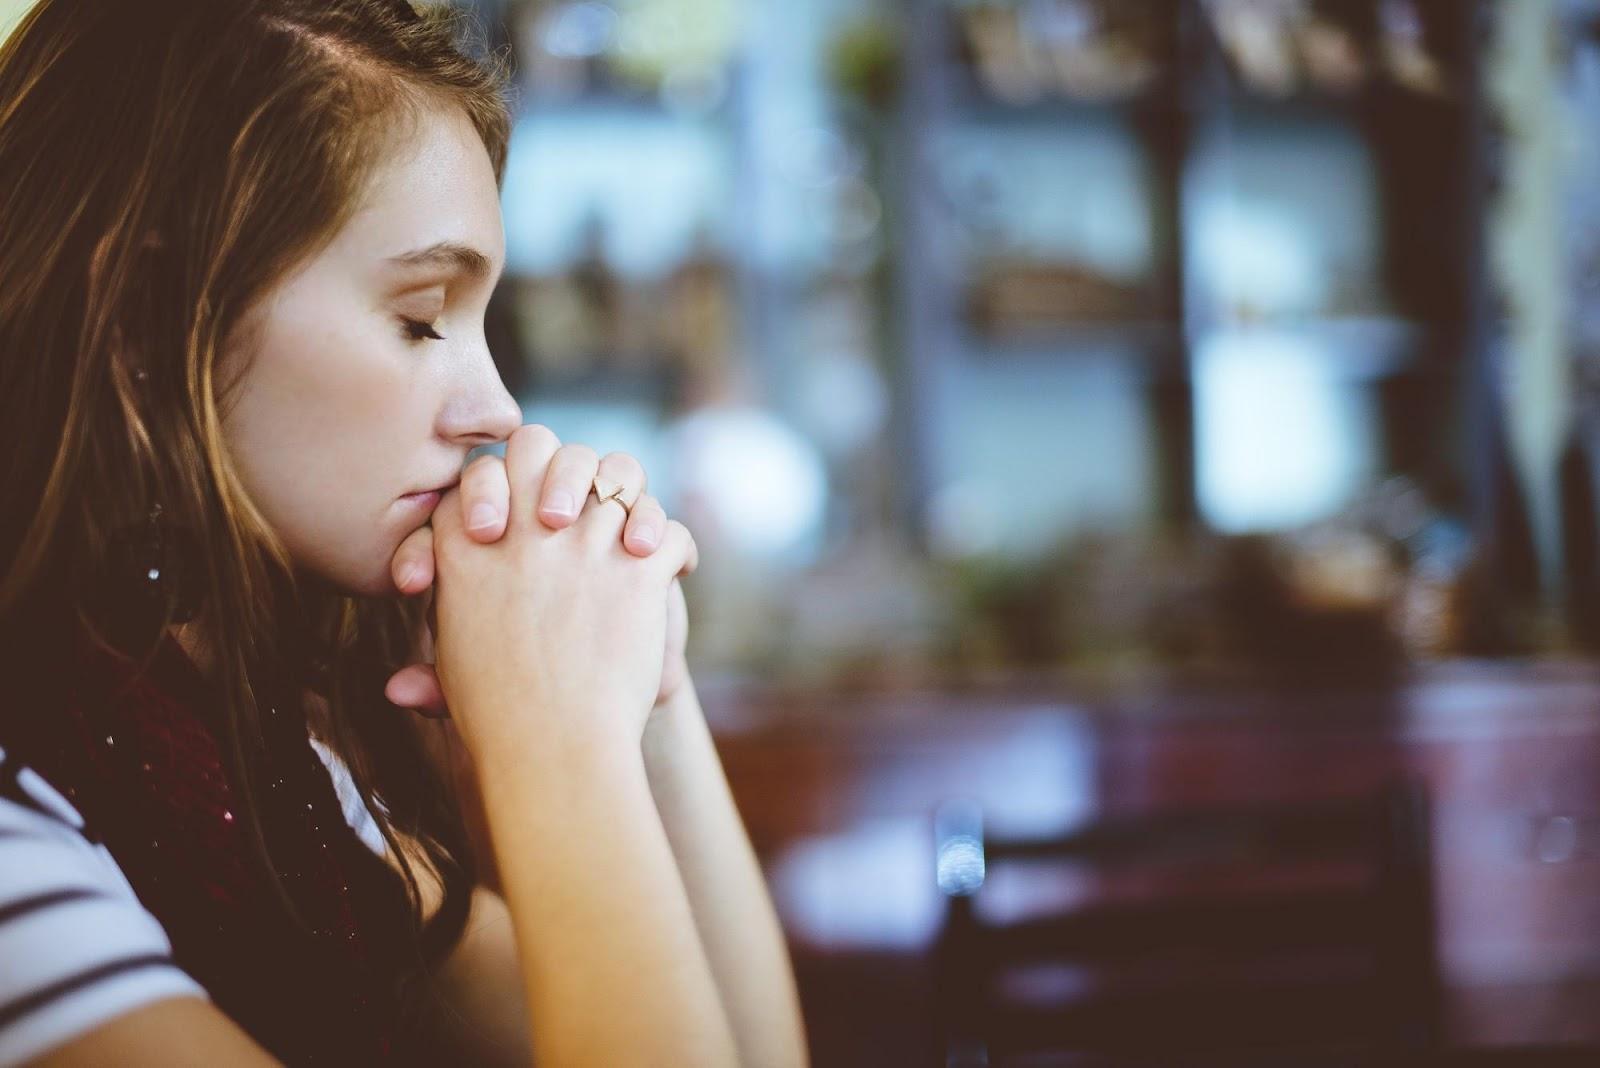 Unique Faith Based Fashion   Christian T shirts for Women